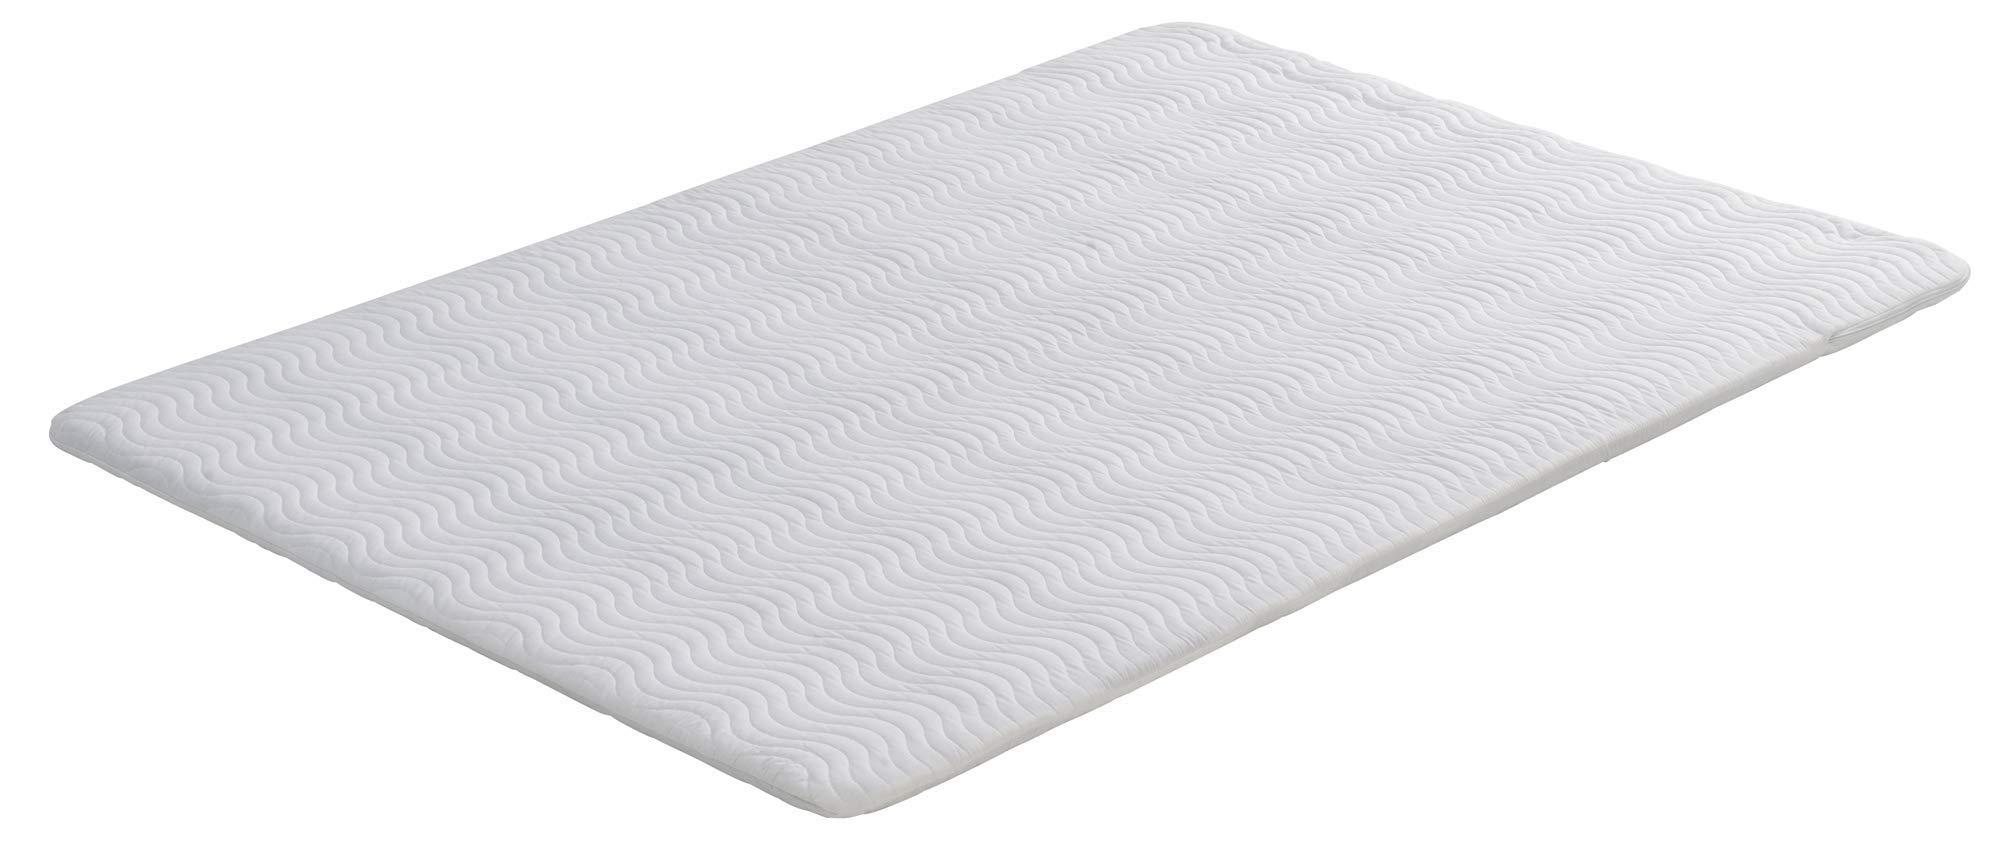 Signature Sleep Ultra Steel Bunkie Board, Full White Full by Signature Sleep